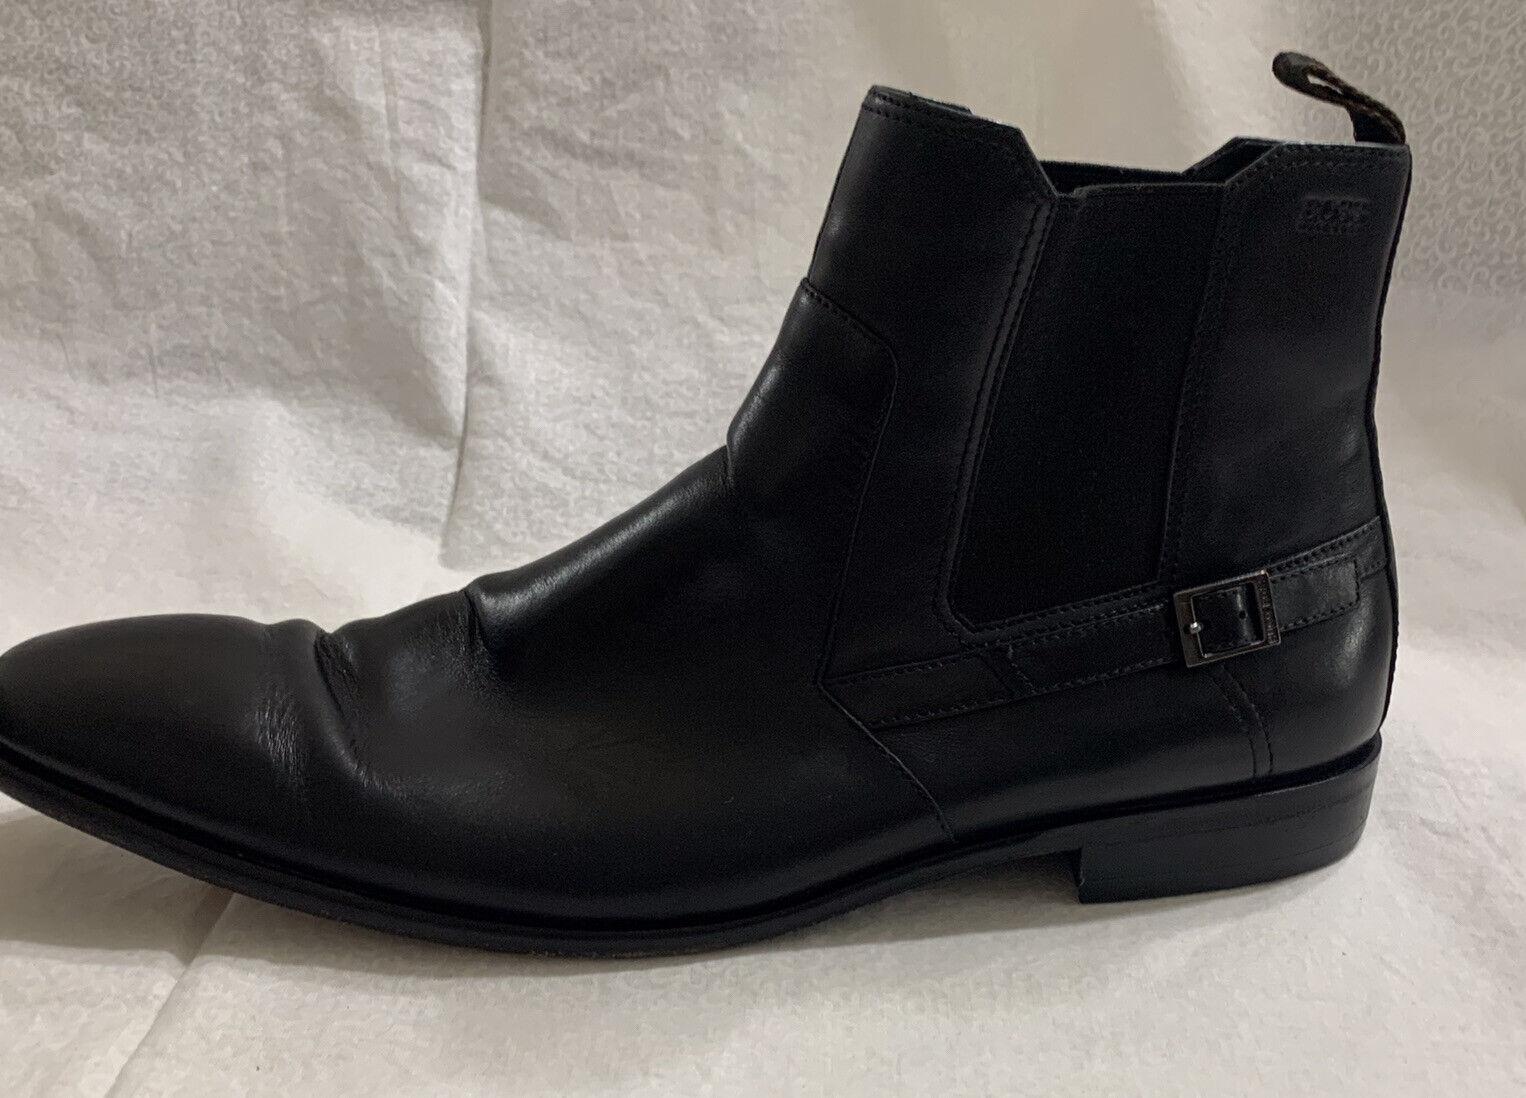 Hugo Boss Ankle Black Leather Ankle